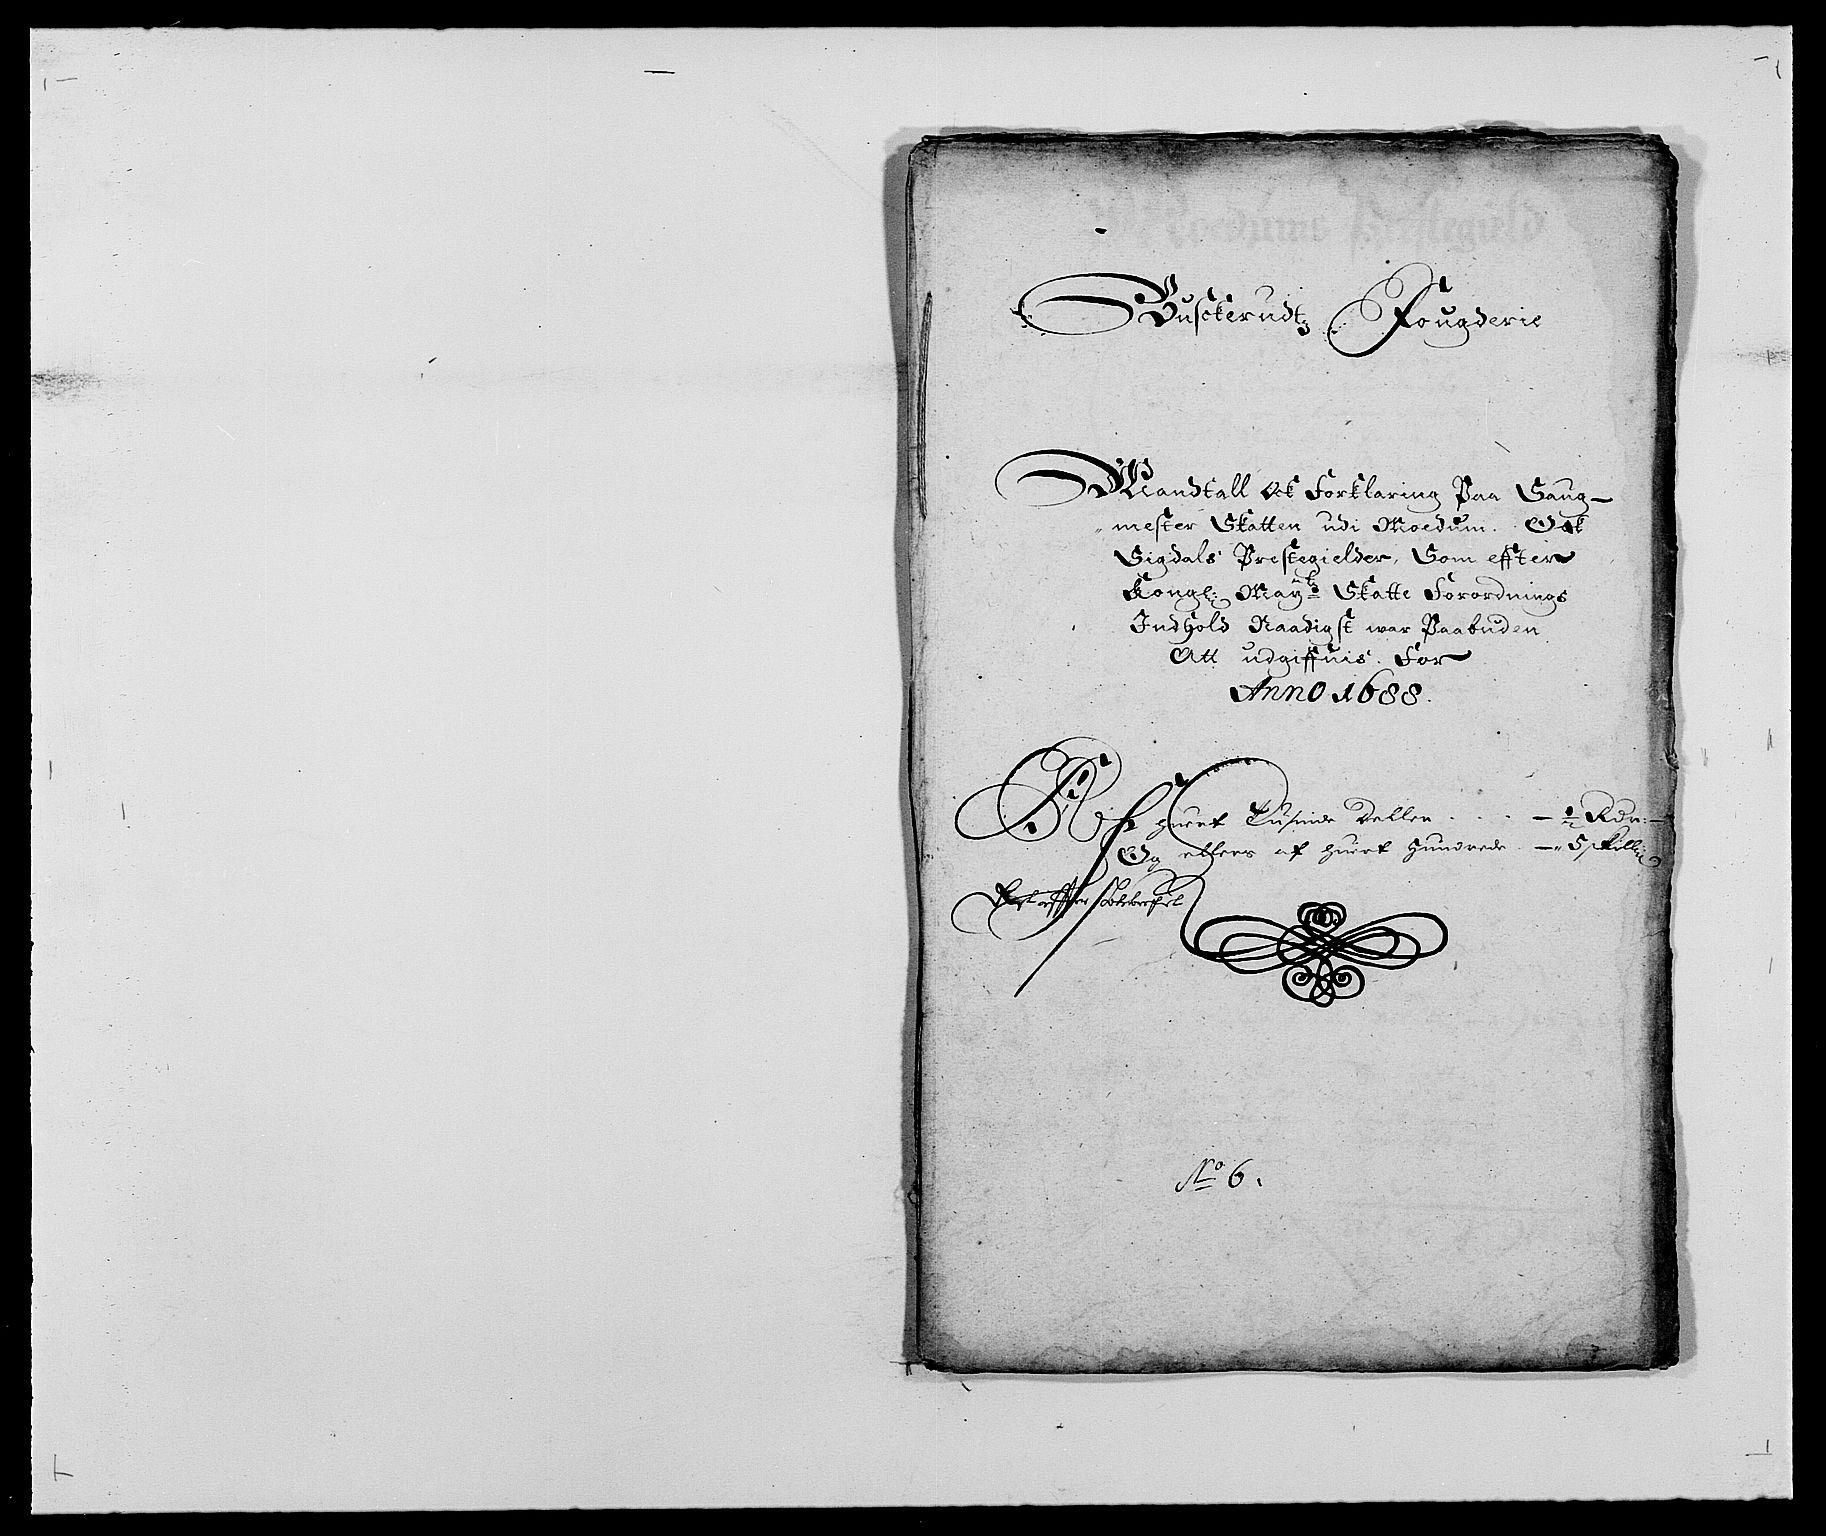 RA, Rentekammeret inntil 1814, Reviderte regnskaper, Fogderegnskap, R25/L1679: Fogderegnskap Buskerud, 1687-1688, s. 430